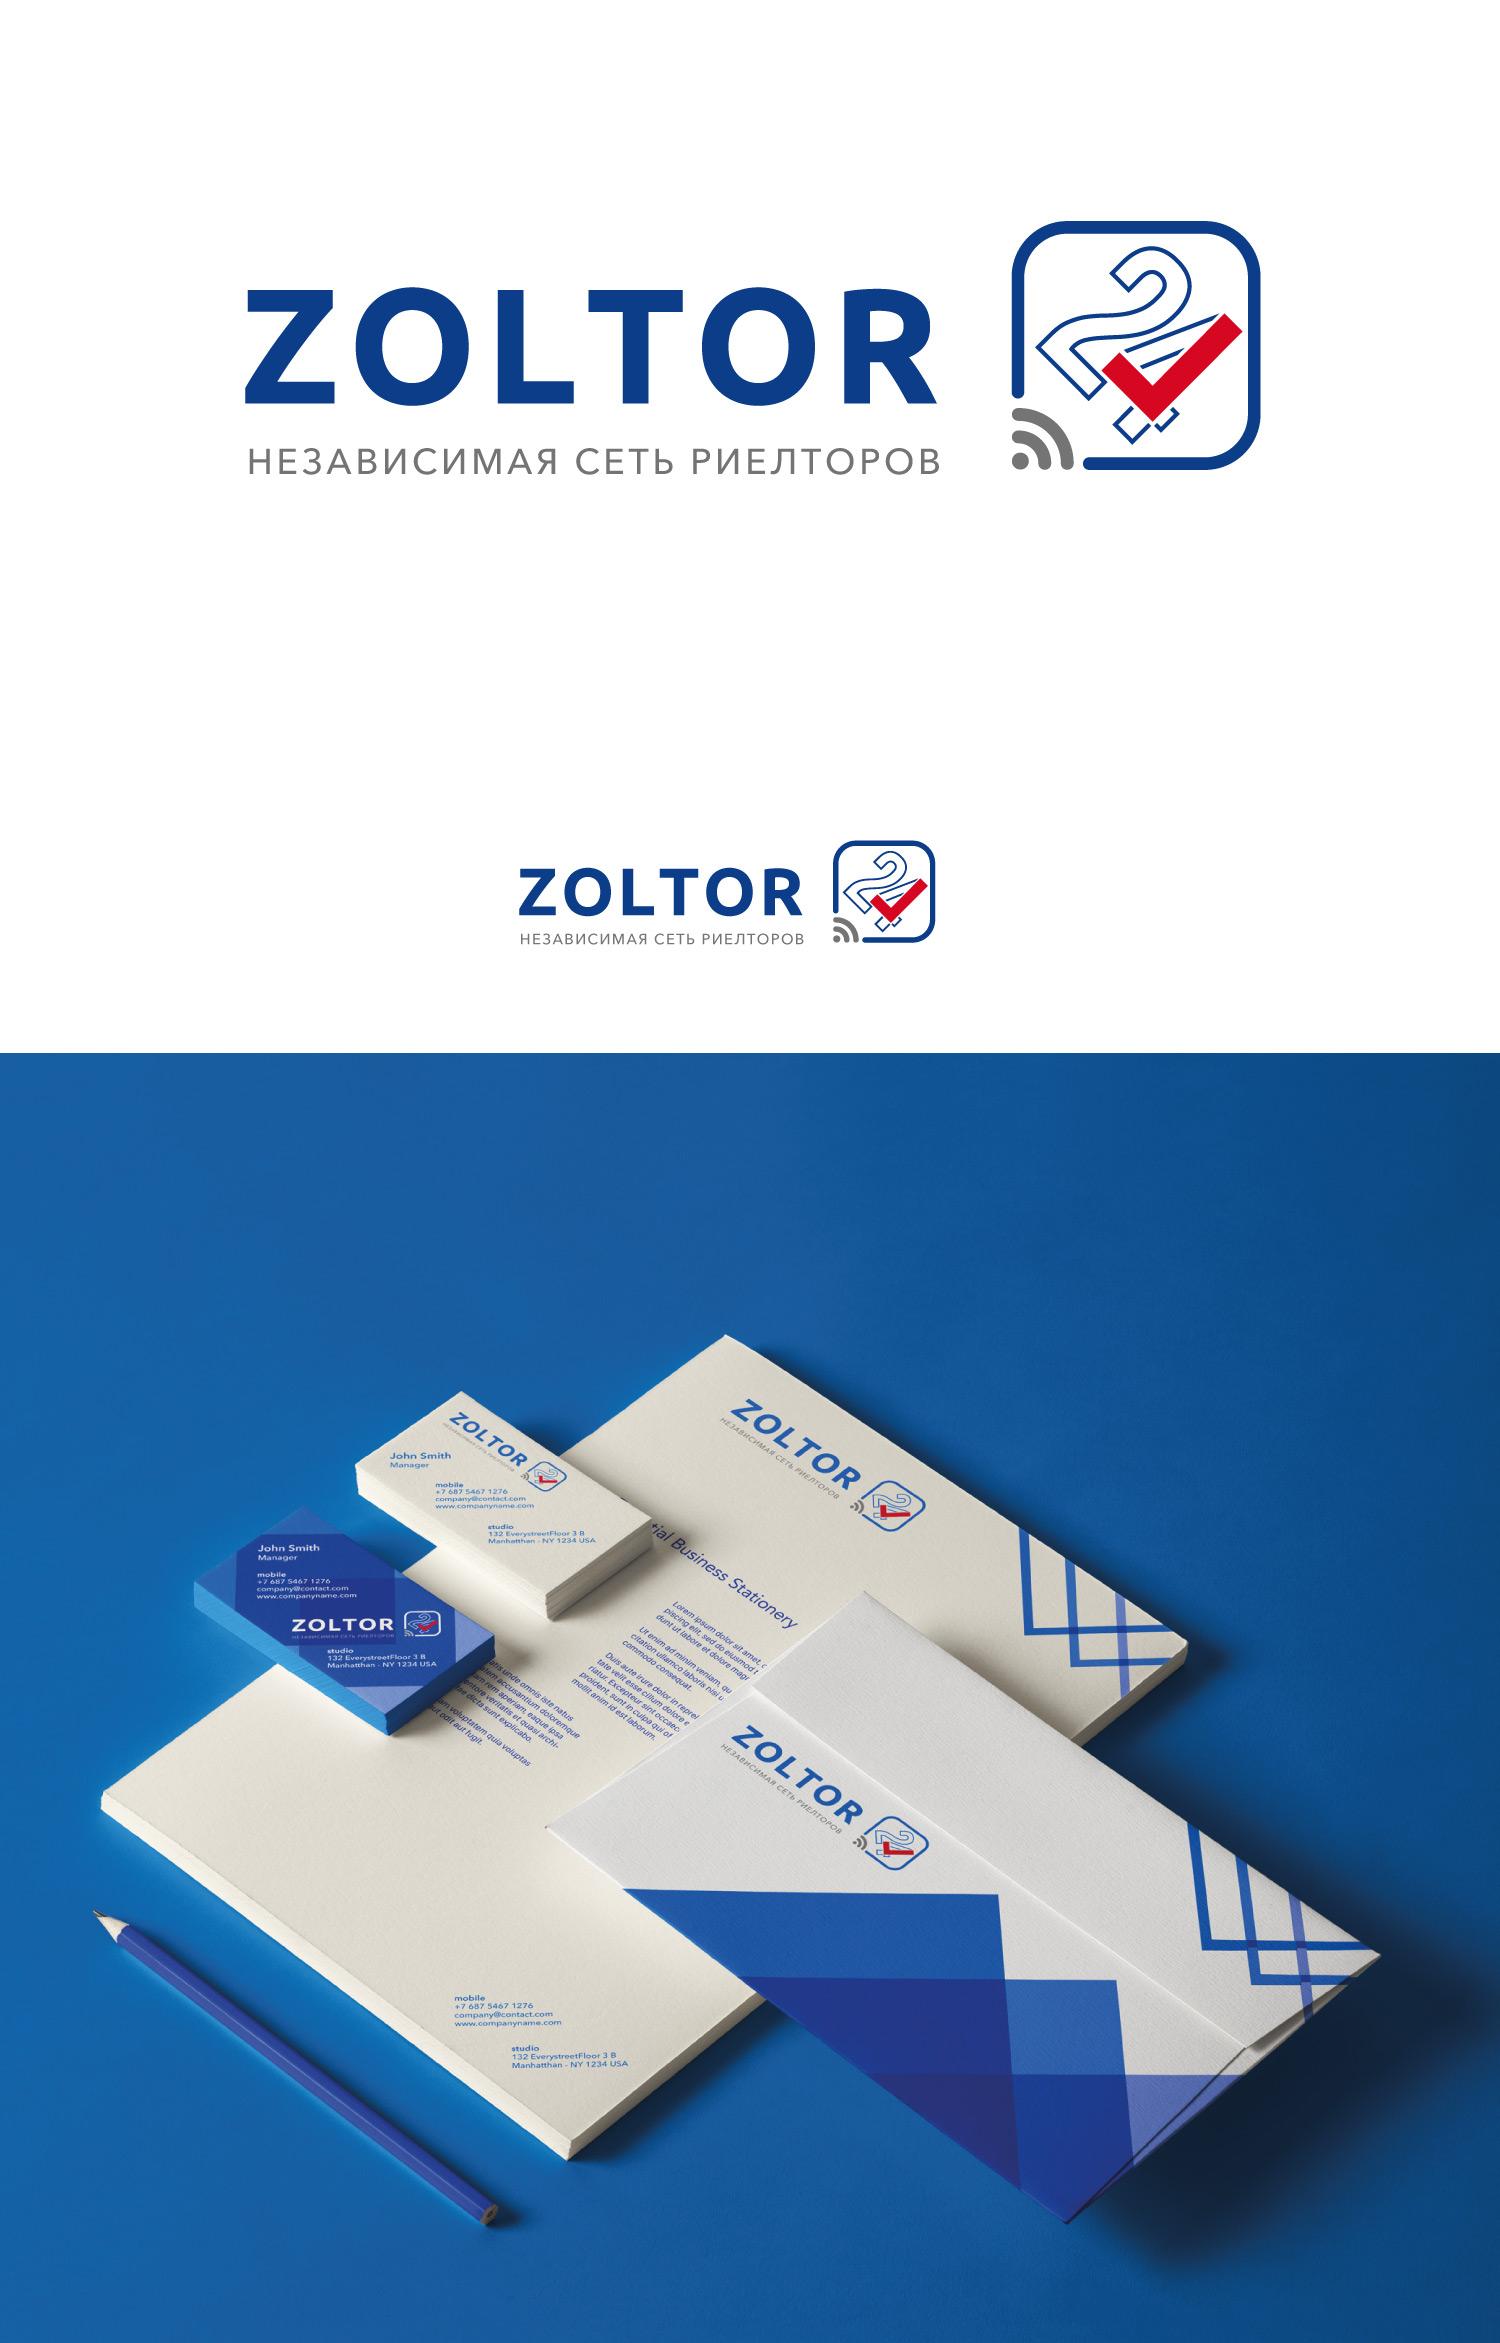 Логотип и фирменный стиль ZolTor24 фото f_8445c911cc9c4e53.jpg